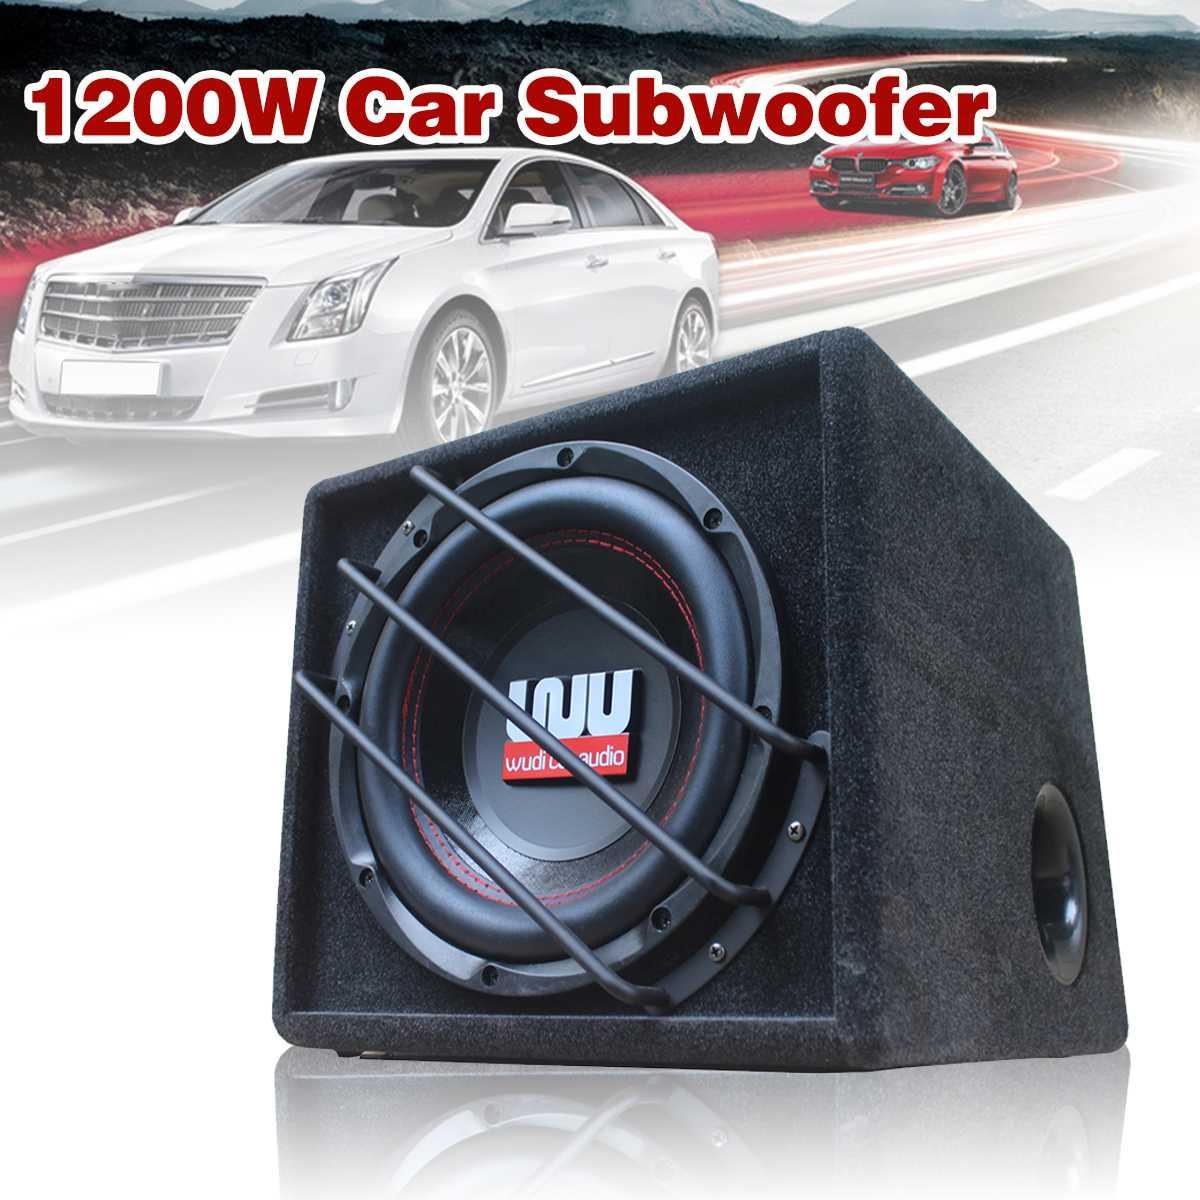 Car-Speaker Car Subwoofer Built-In-Amplifer Auto Super-Bass 10inch 1200w